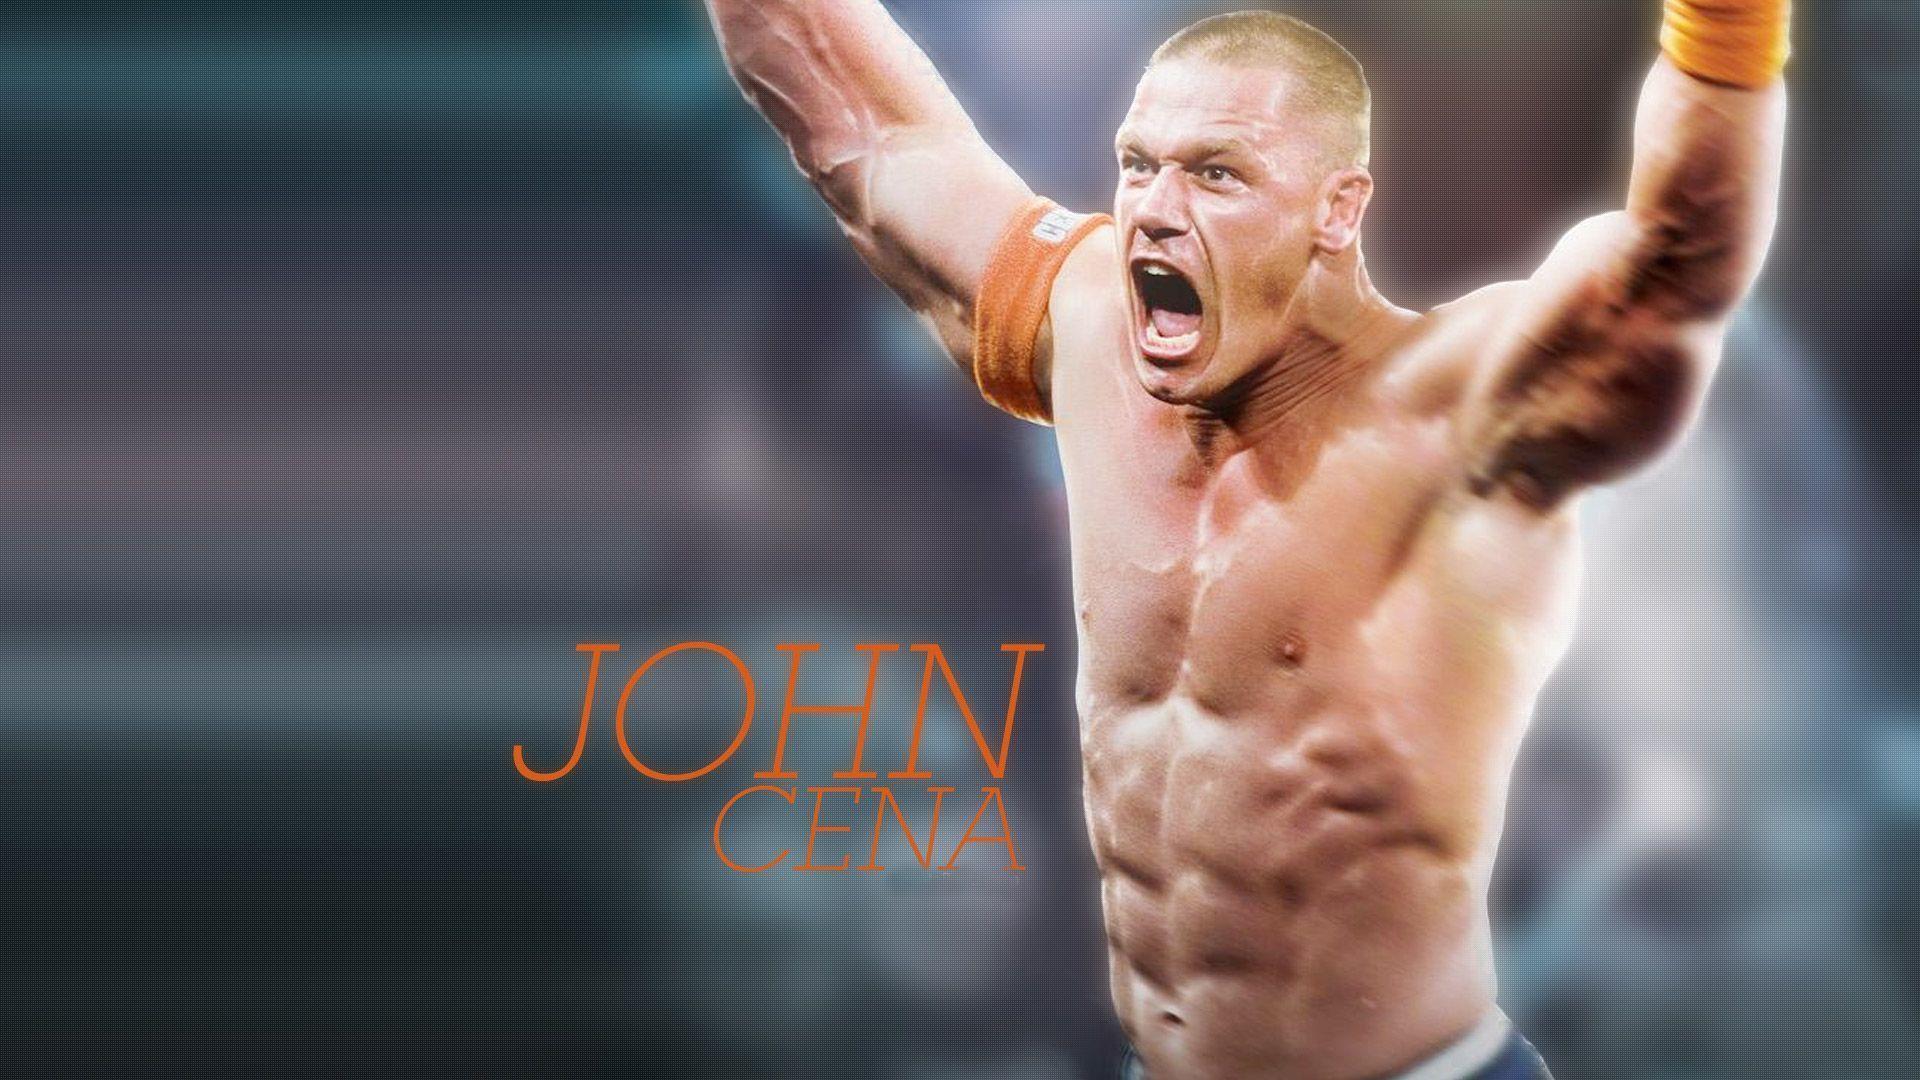 John Cena Widescreen Image 01 | hdwallpapers-